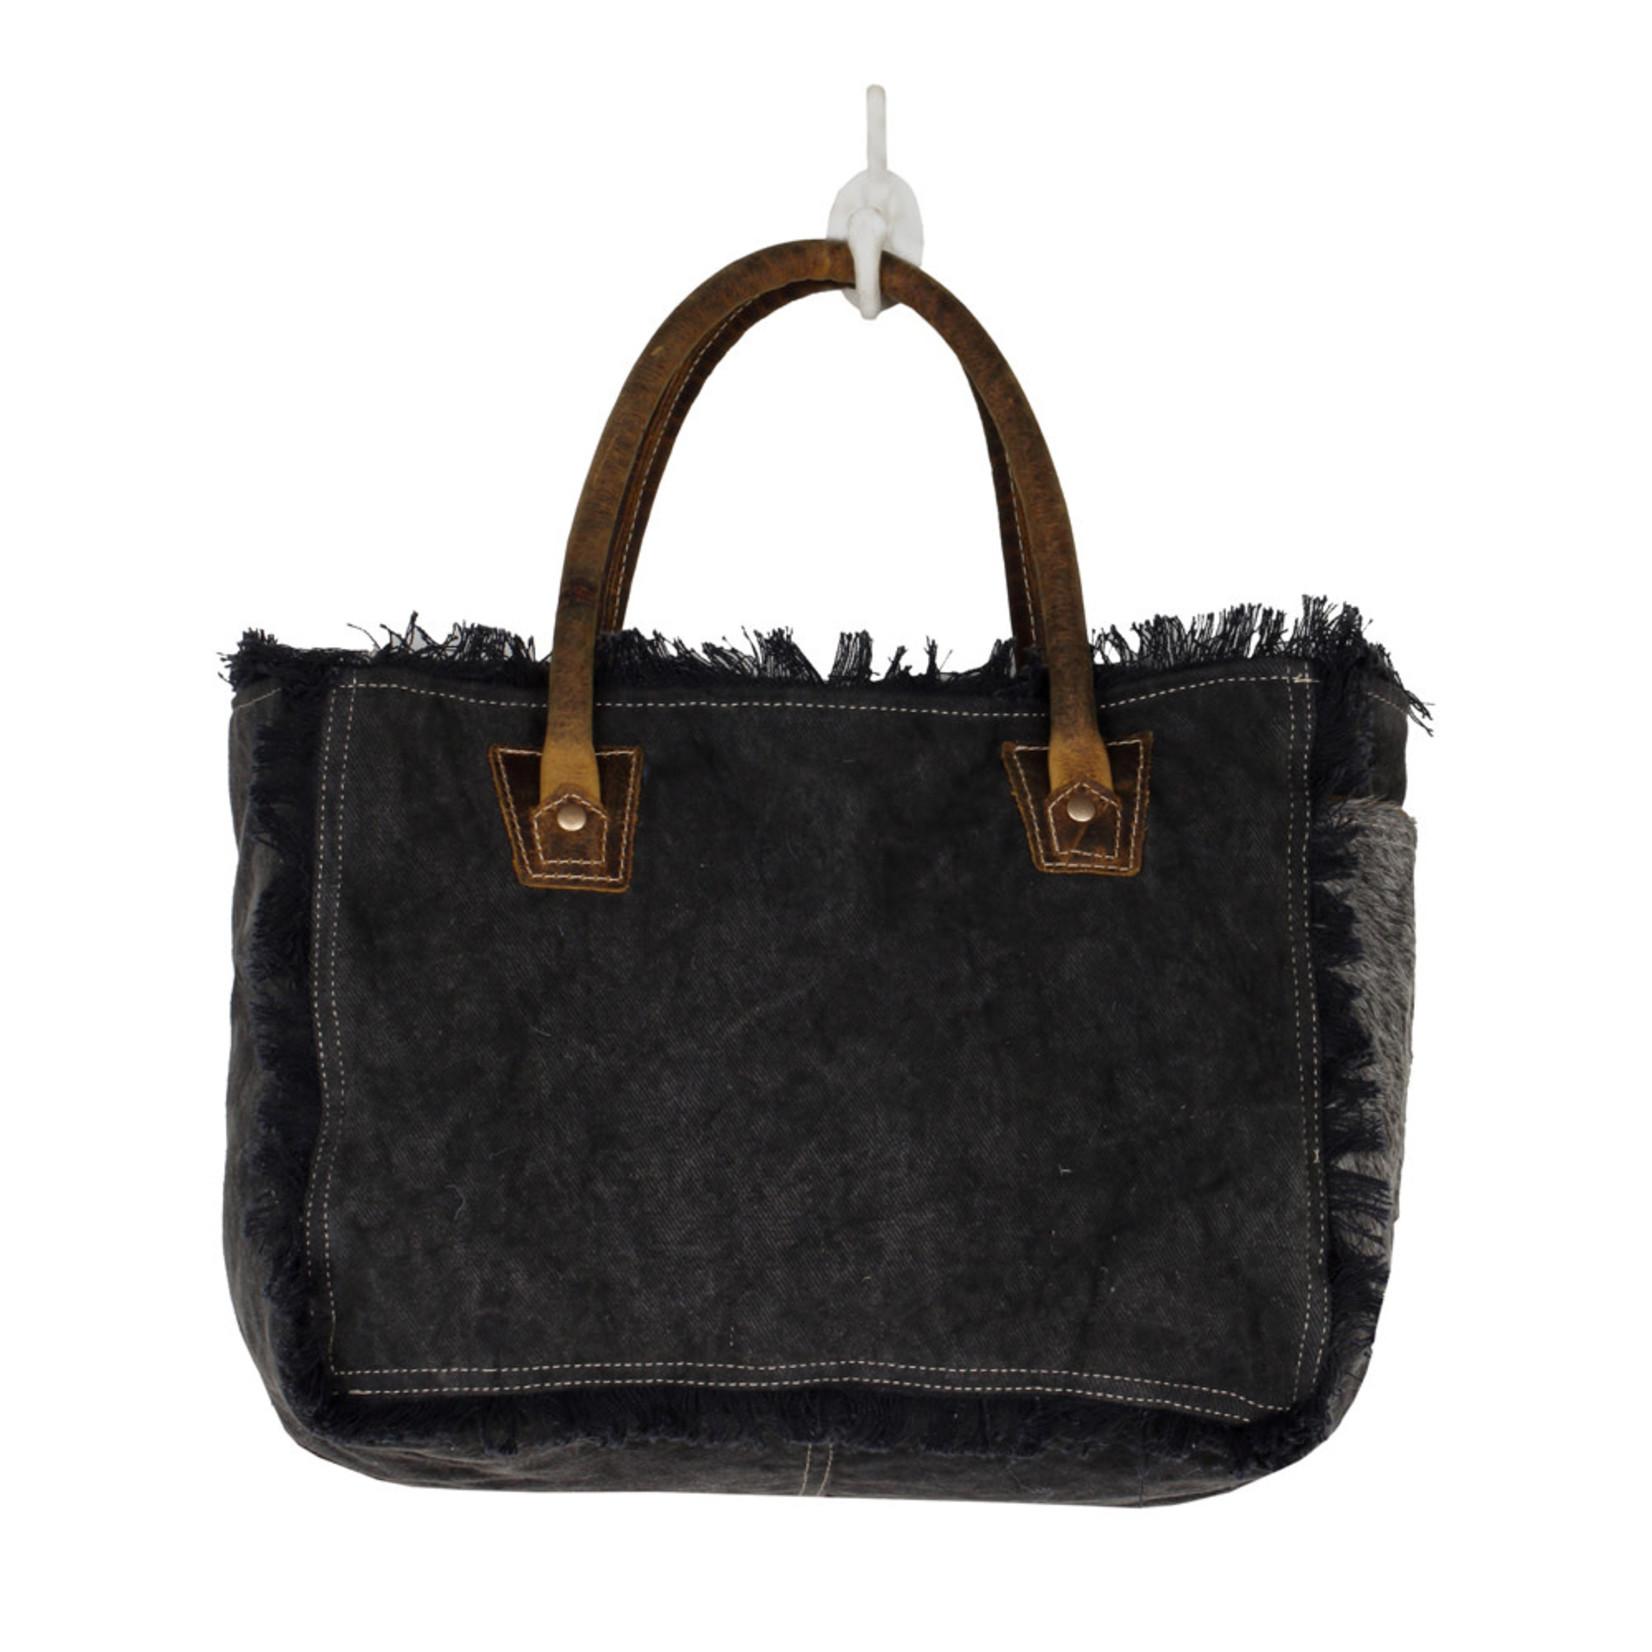 Myra Bags S-2640 Offbeat Small Bag